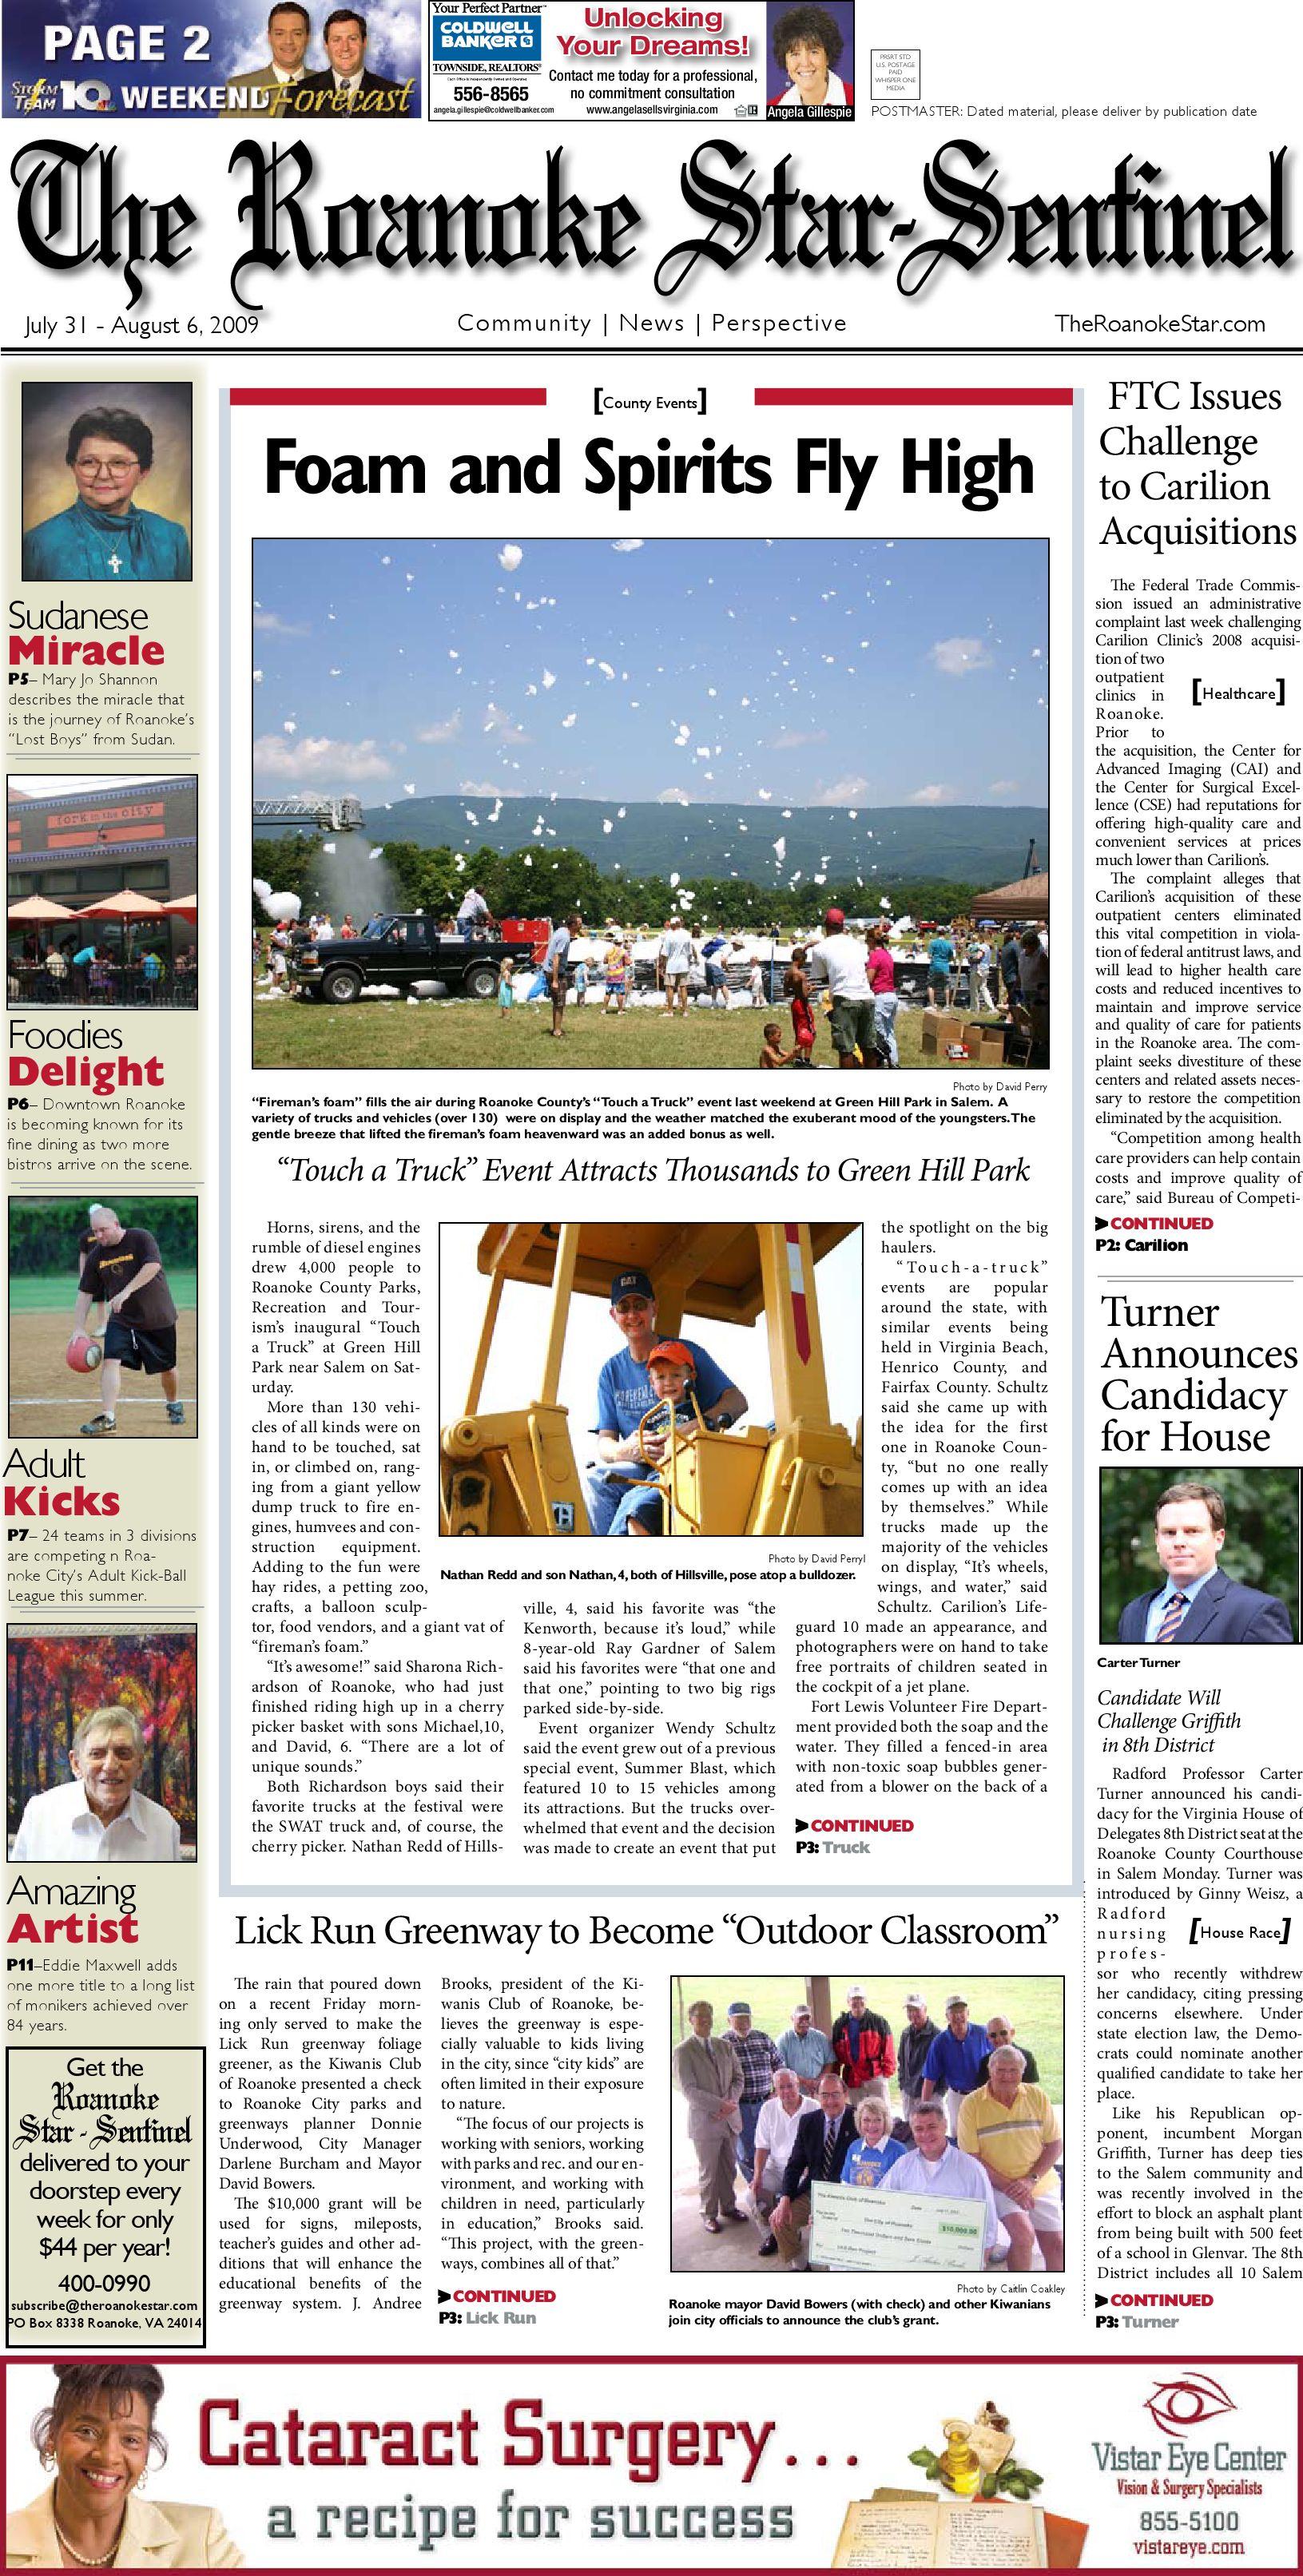 The Roanoke Star-Sentinel